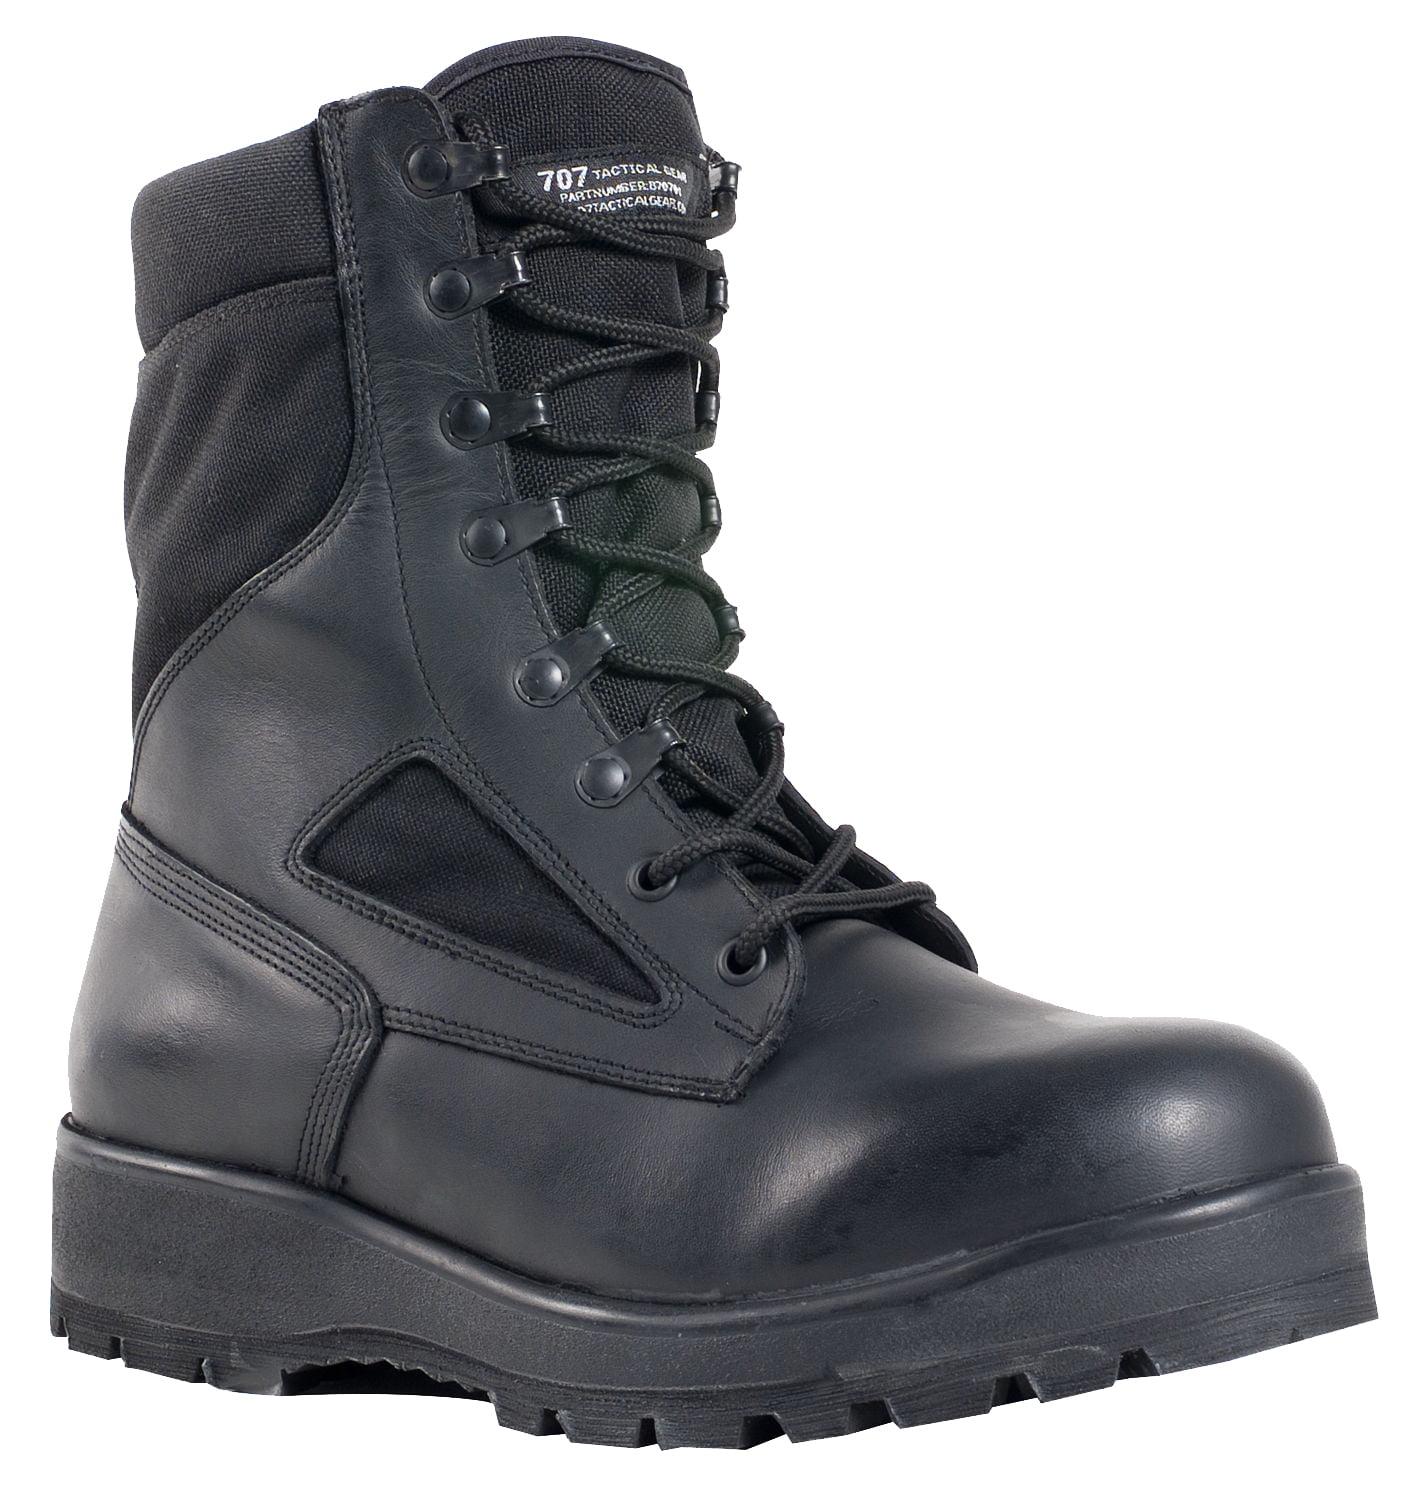 SixKa Men's Combat Mil-Spec Tactical and Military Boot